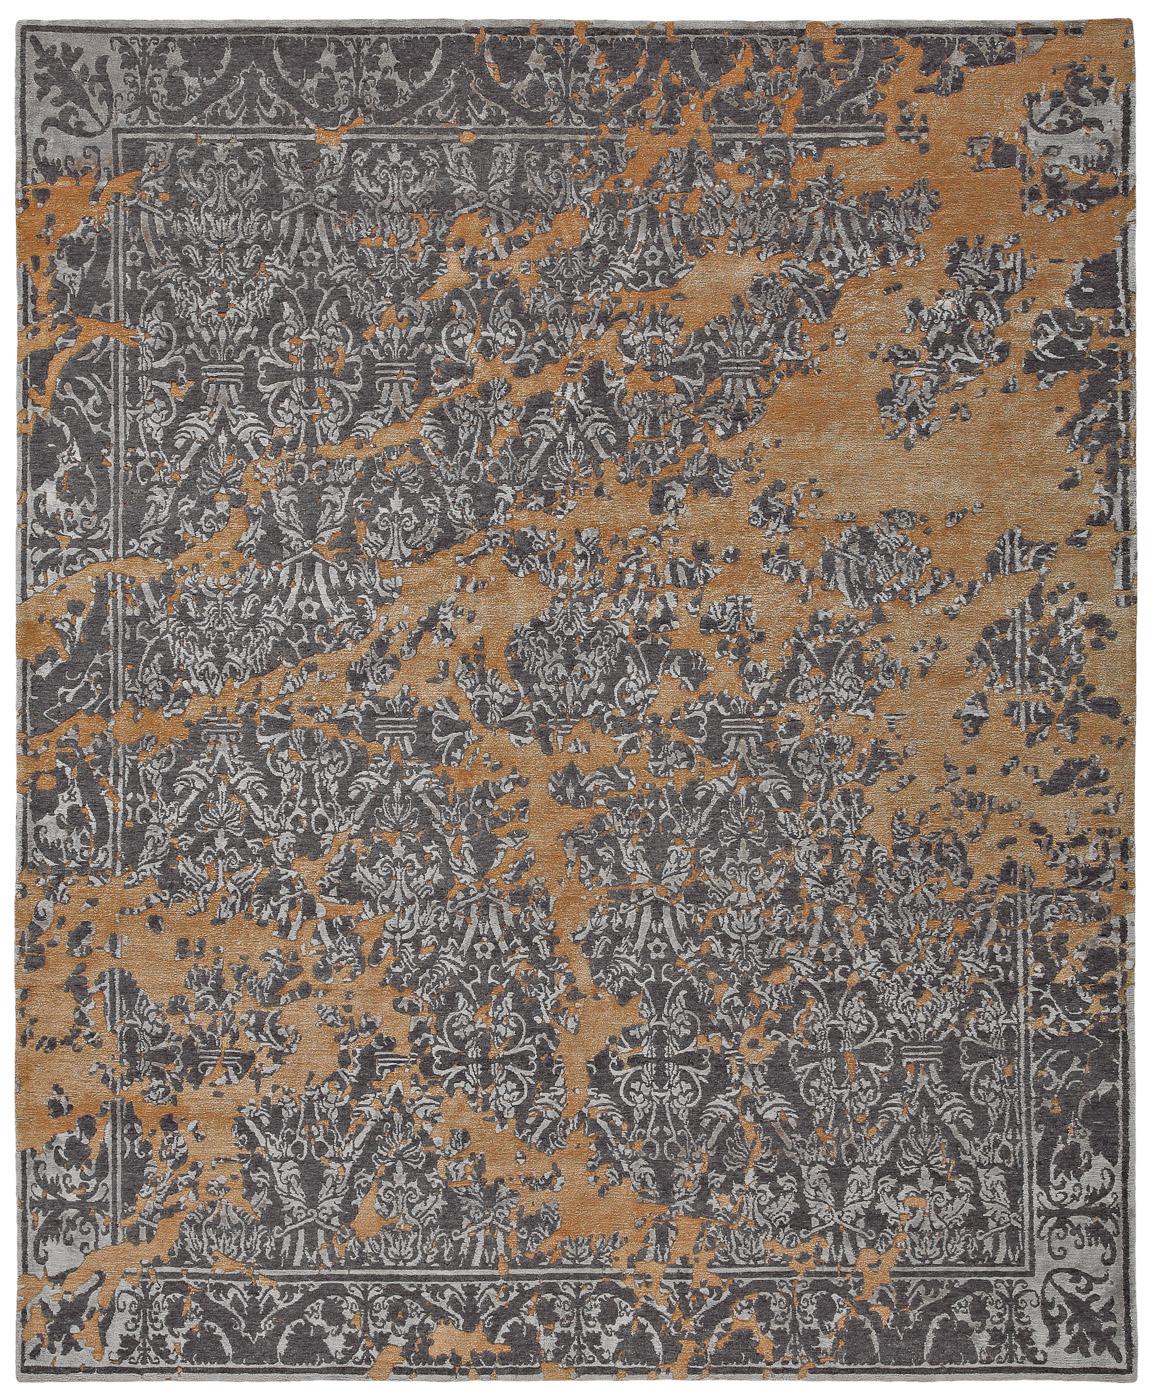 teppich jan kath amazing rug patterned wool silk bidjar muted jan kath rug with teppich jan. Black Bedroom Furniture Sets. Home Design Ideas